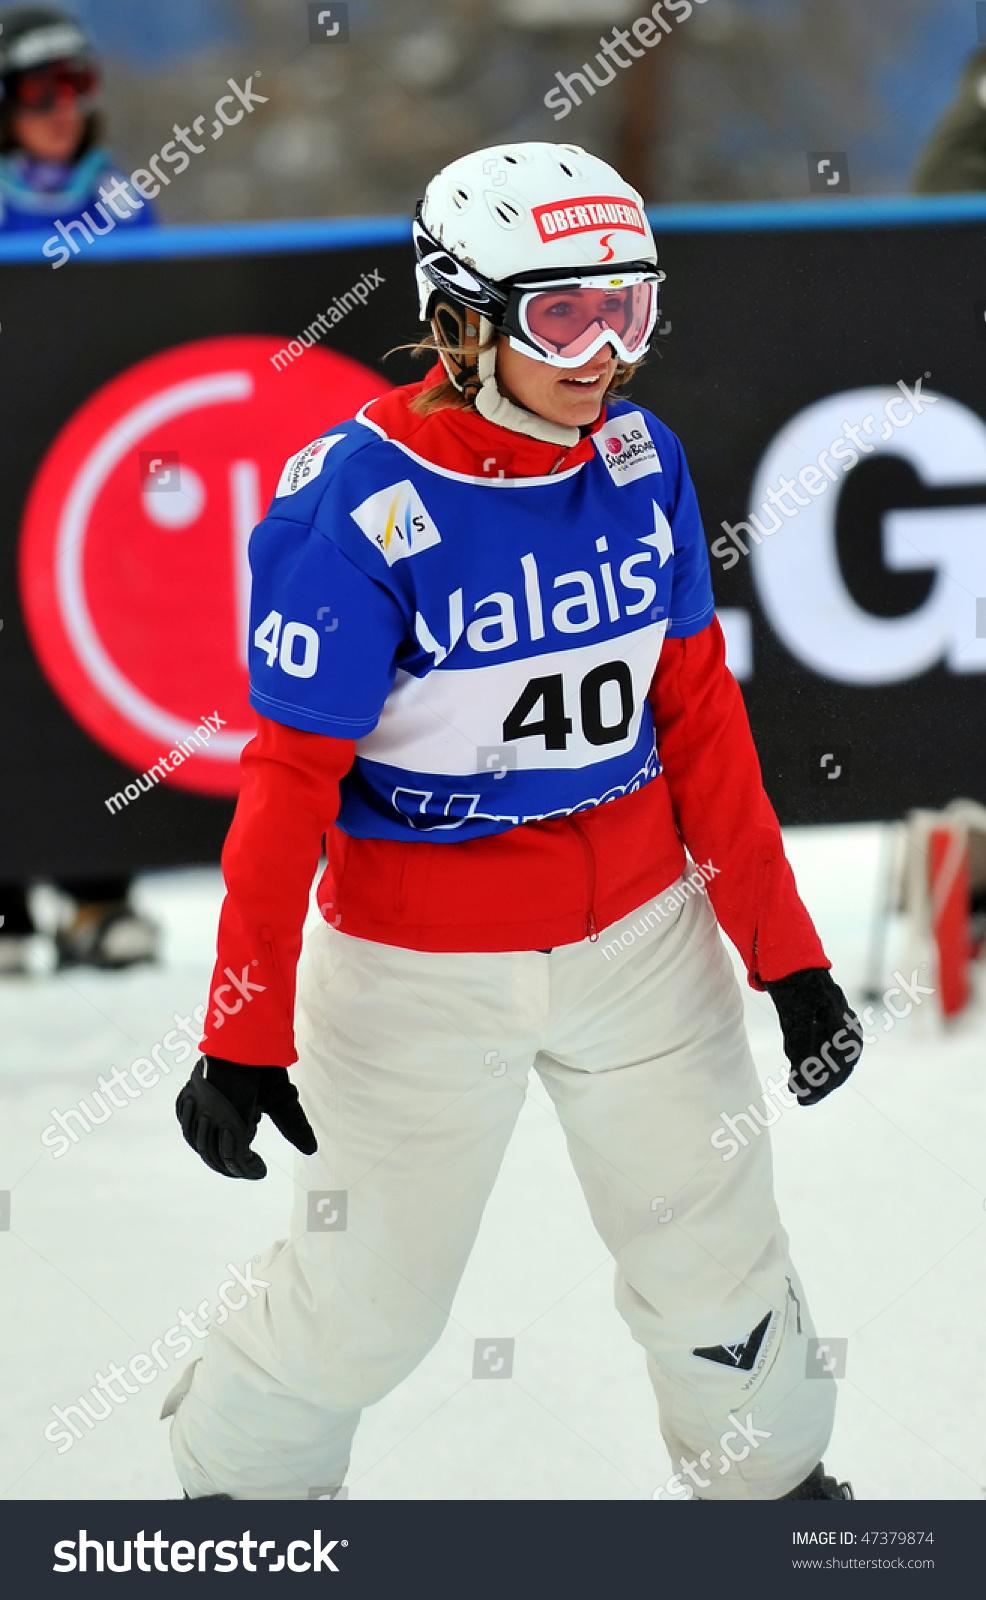 Turin 2006 Snowboard Cross women - Olympic Snowboard